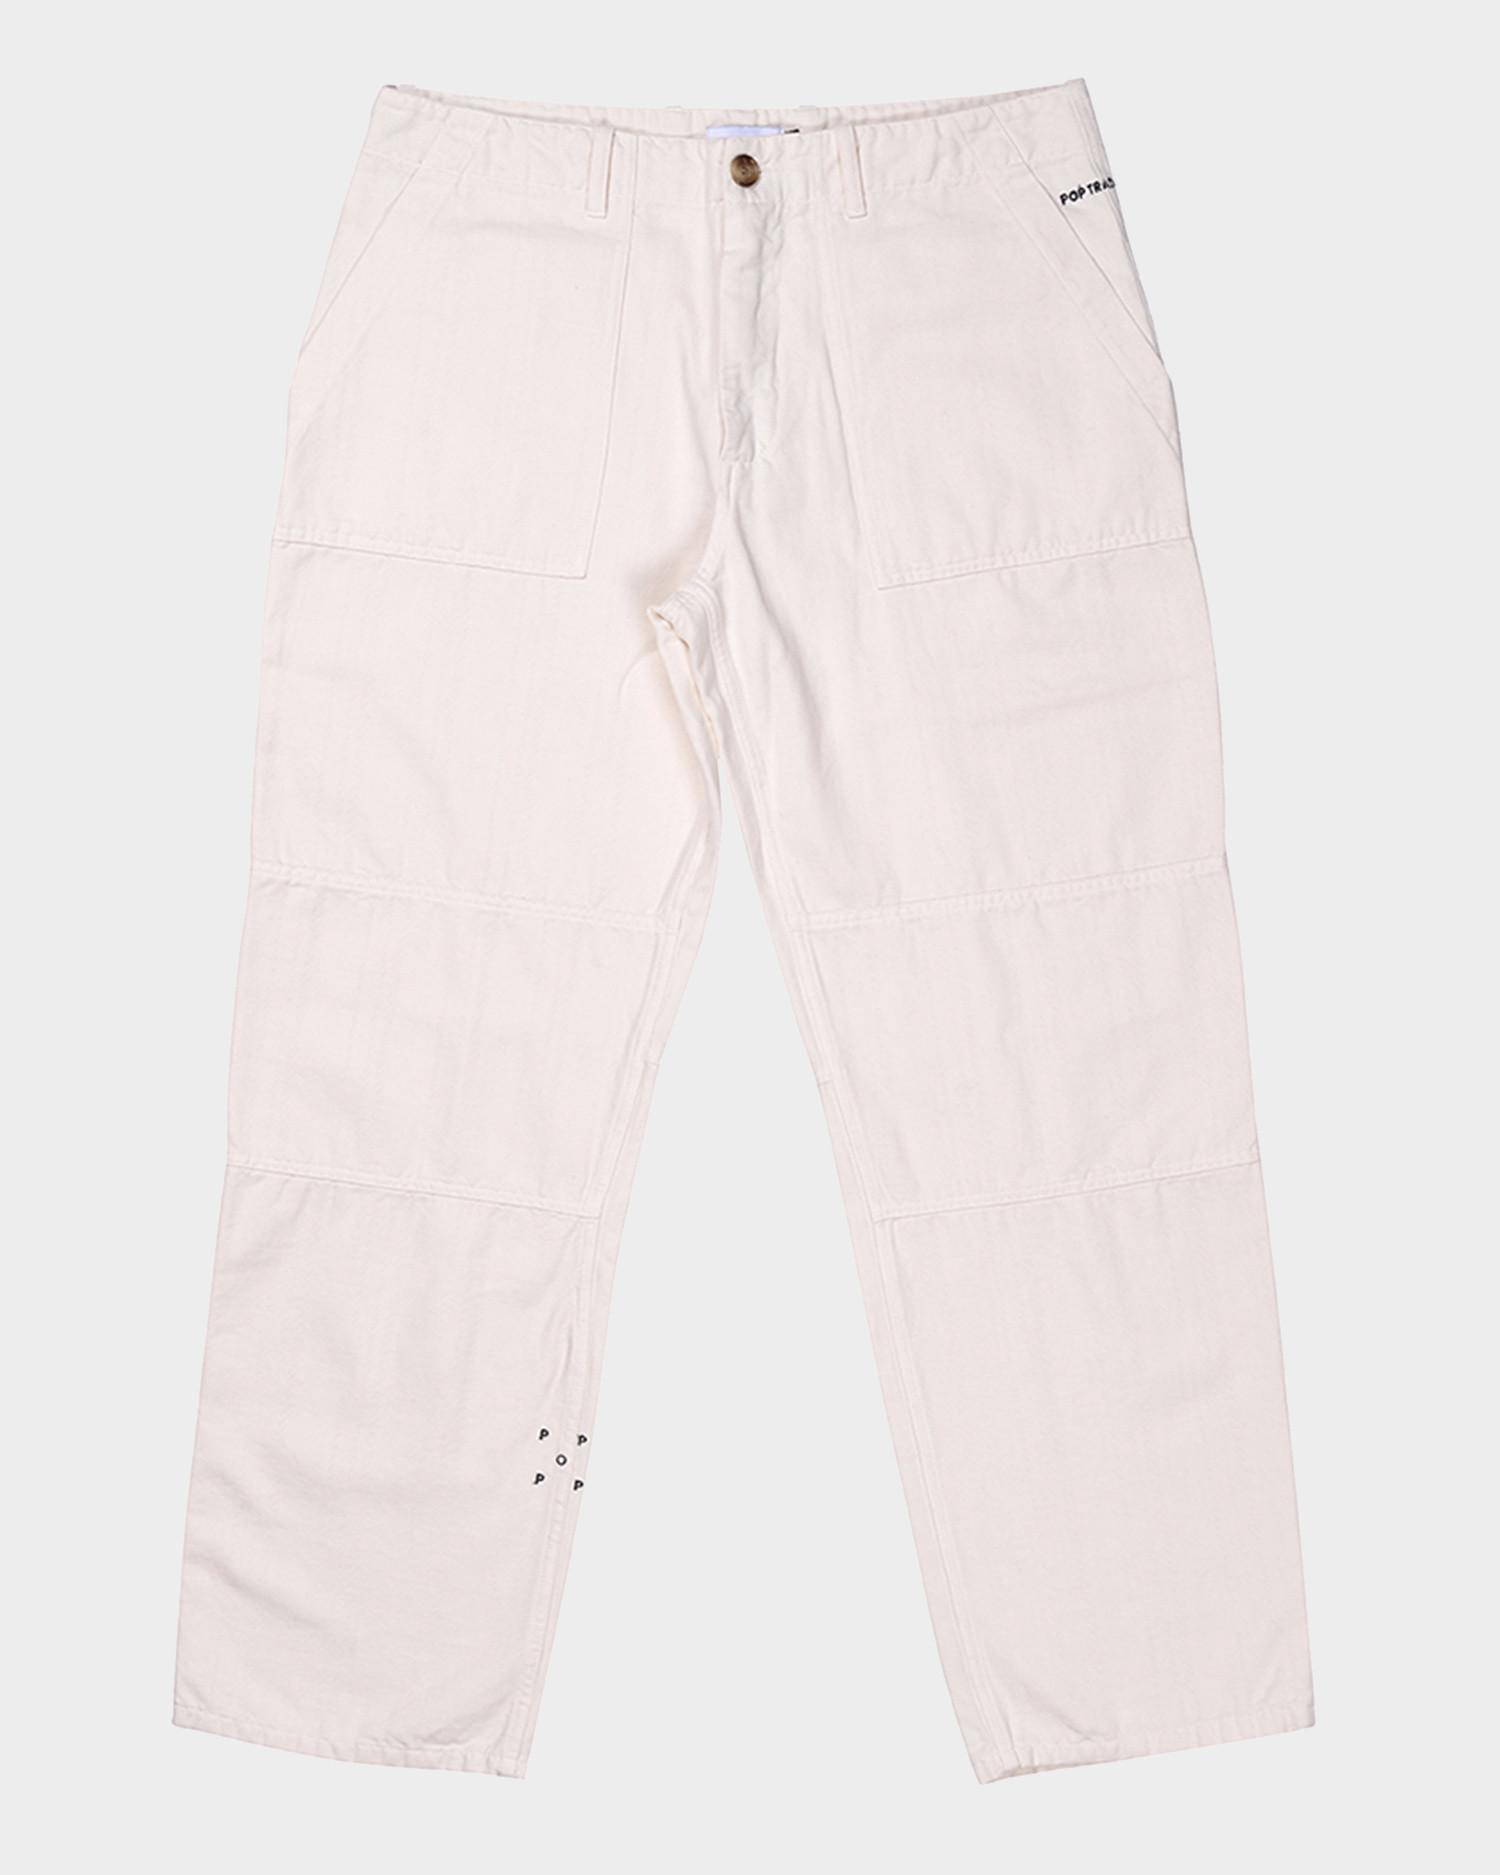 Pop Trading Company Phatigue Fam Pants Off White